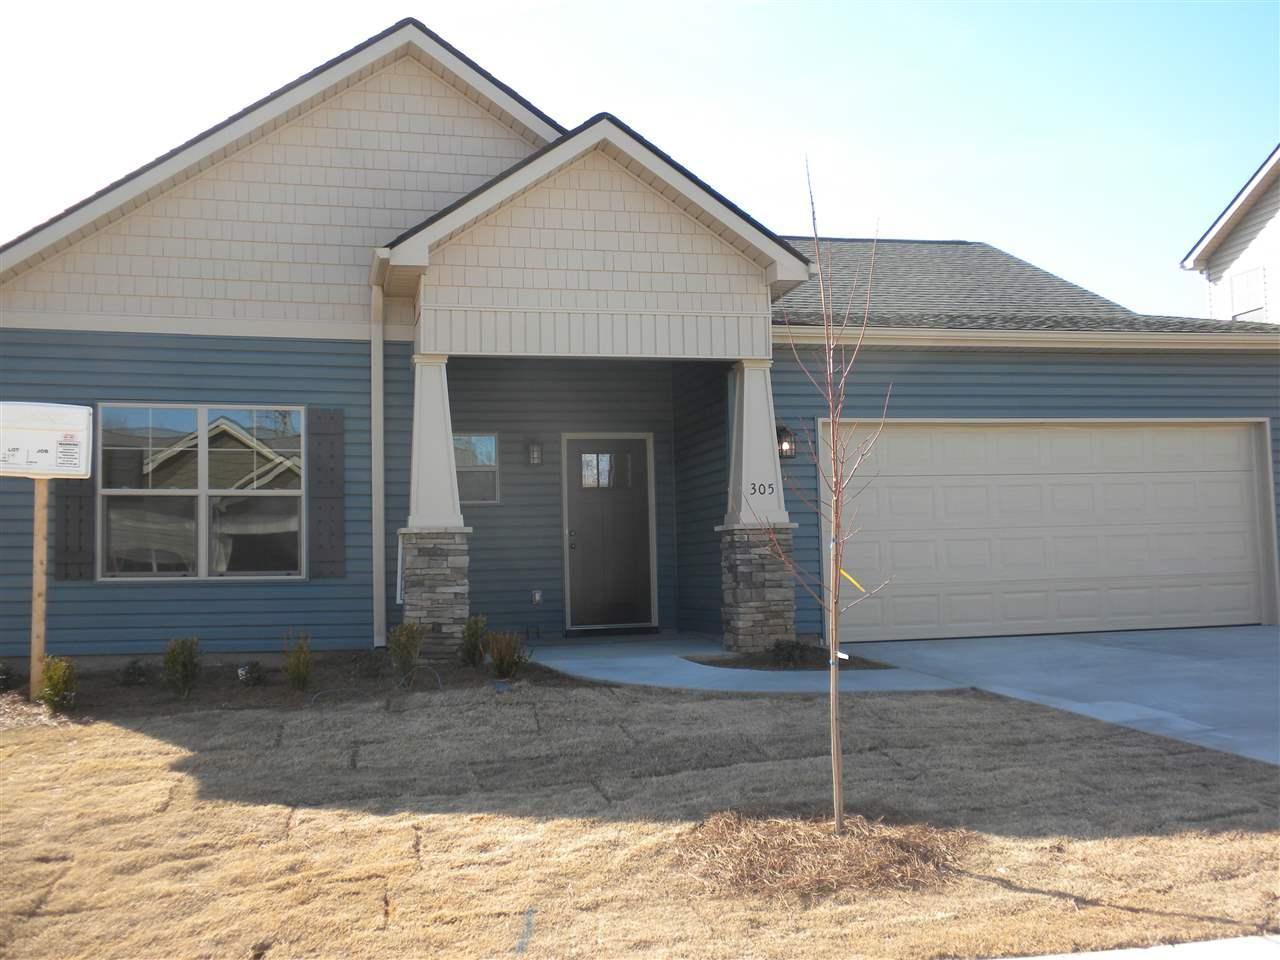 305 Sliding Rock Drive, Pendleton, SC 29670 (MLS #20178603) :: Les Walden Real Estate